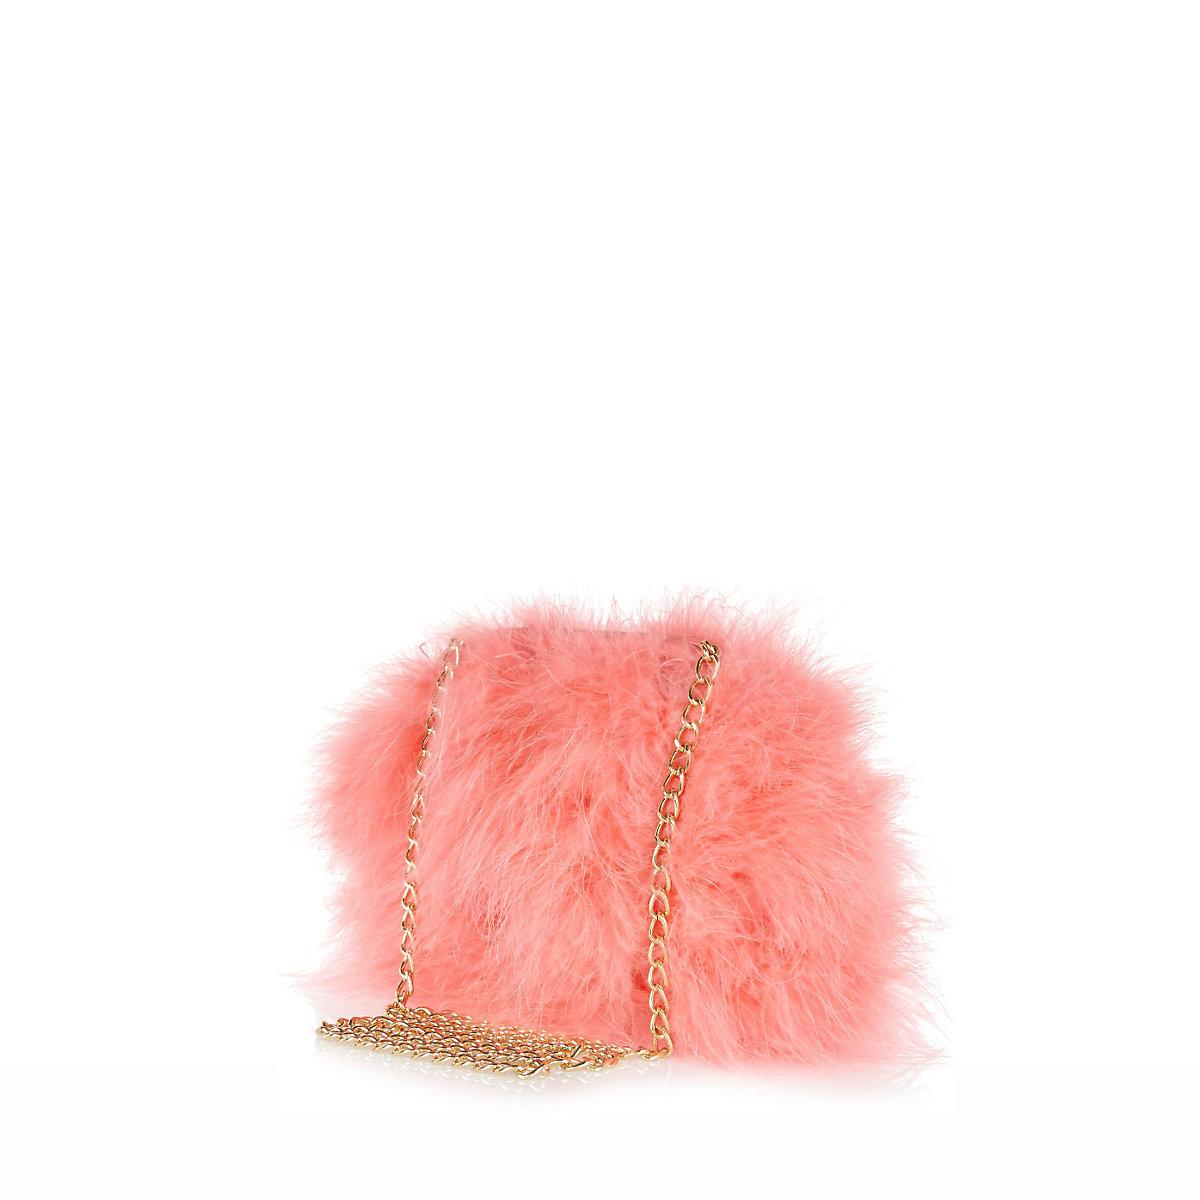 Pink fluffy cross body bag